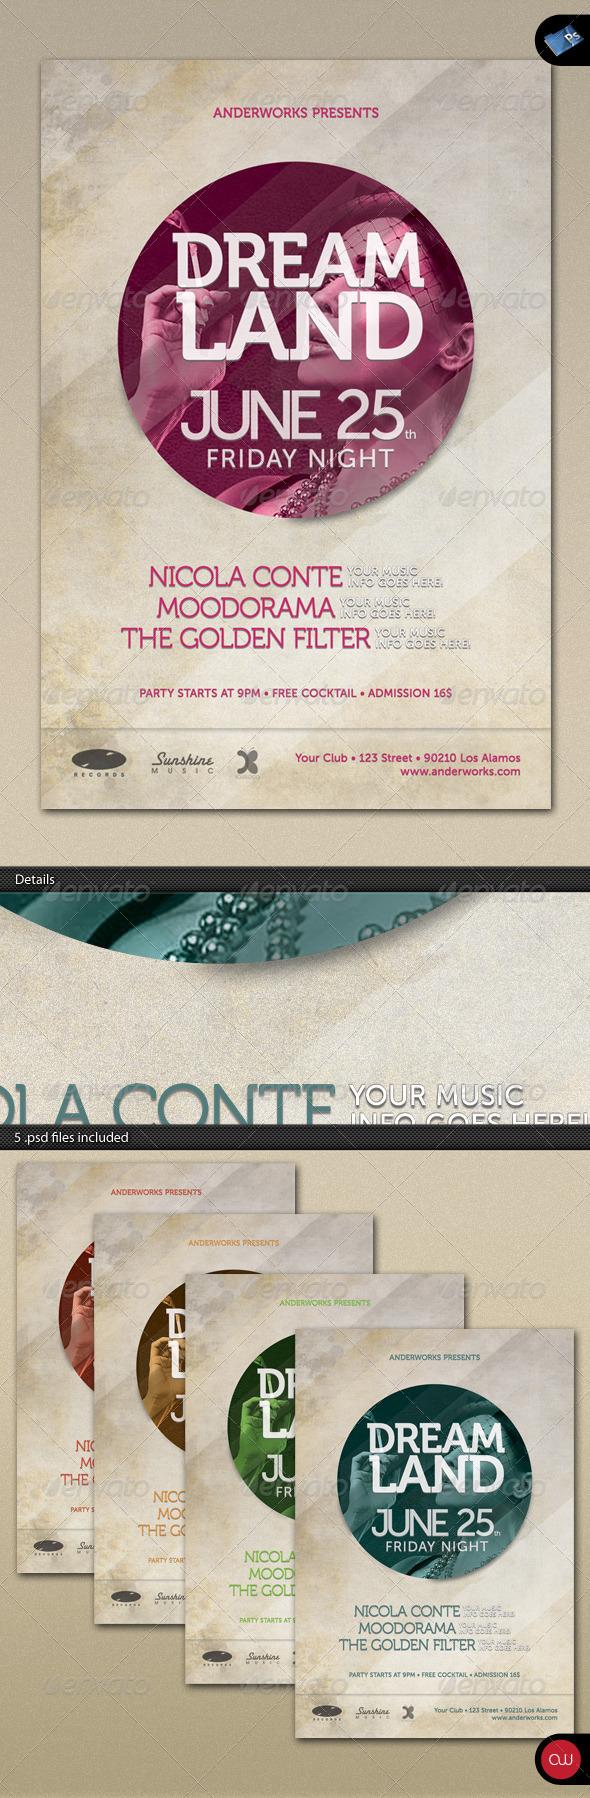 GraphicRiver Music & Event Flyer Dreamland 2 236189